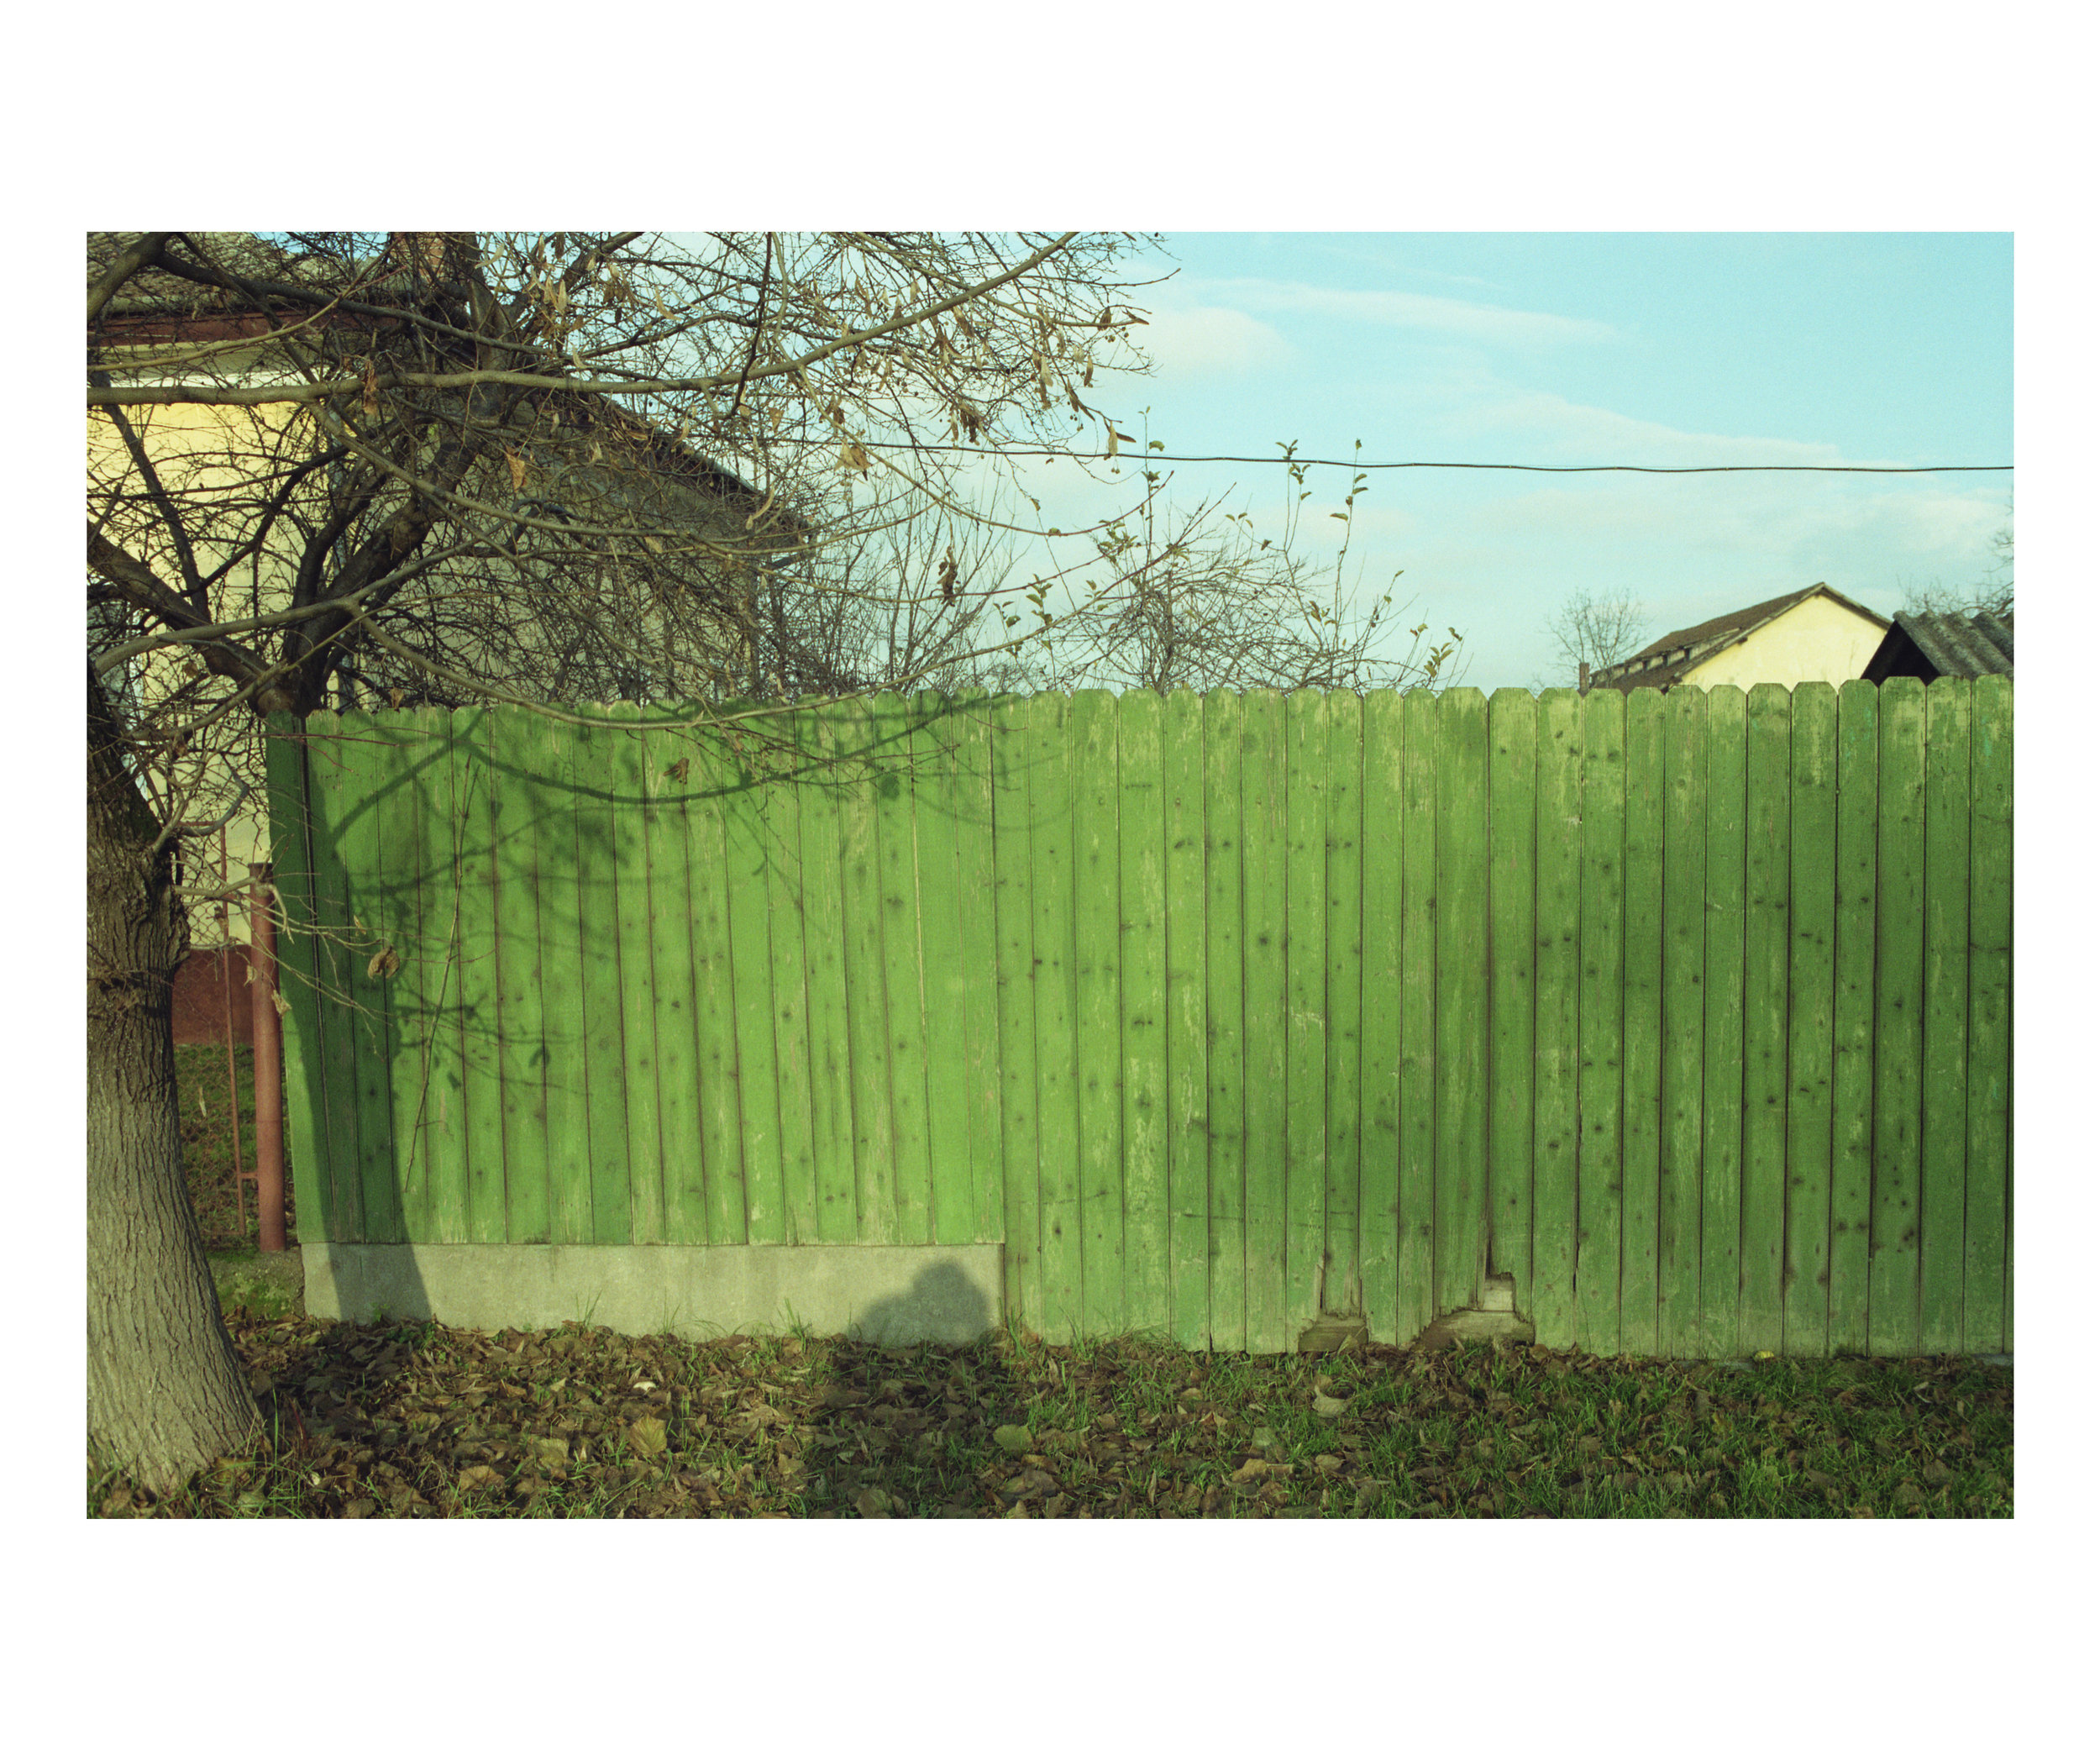 Ovidiu Gordan photobook familiar place photography Romania_47.jpg